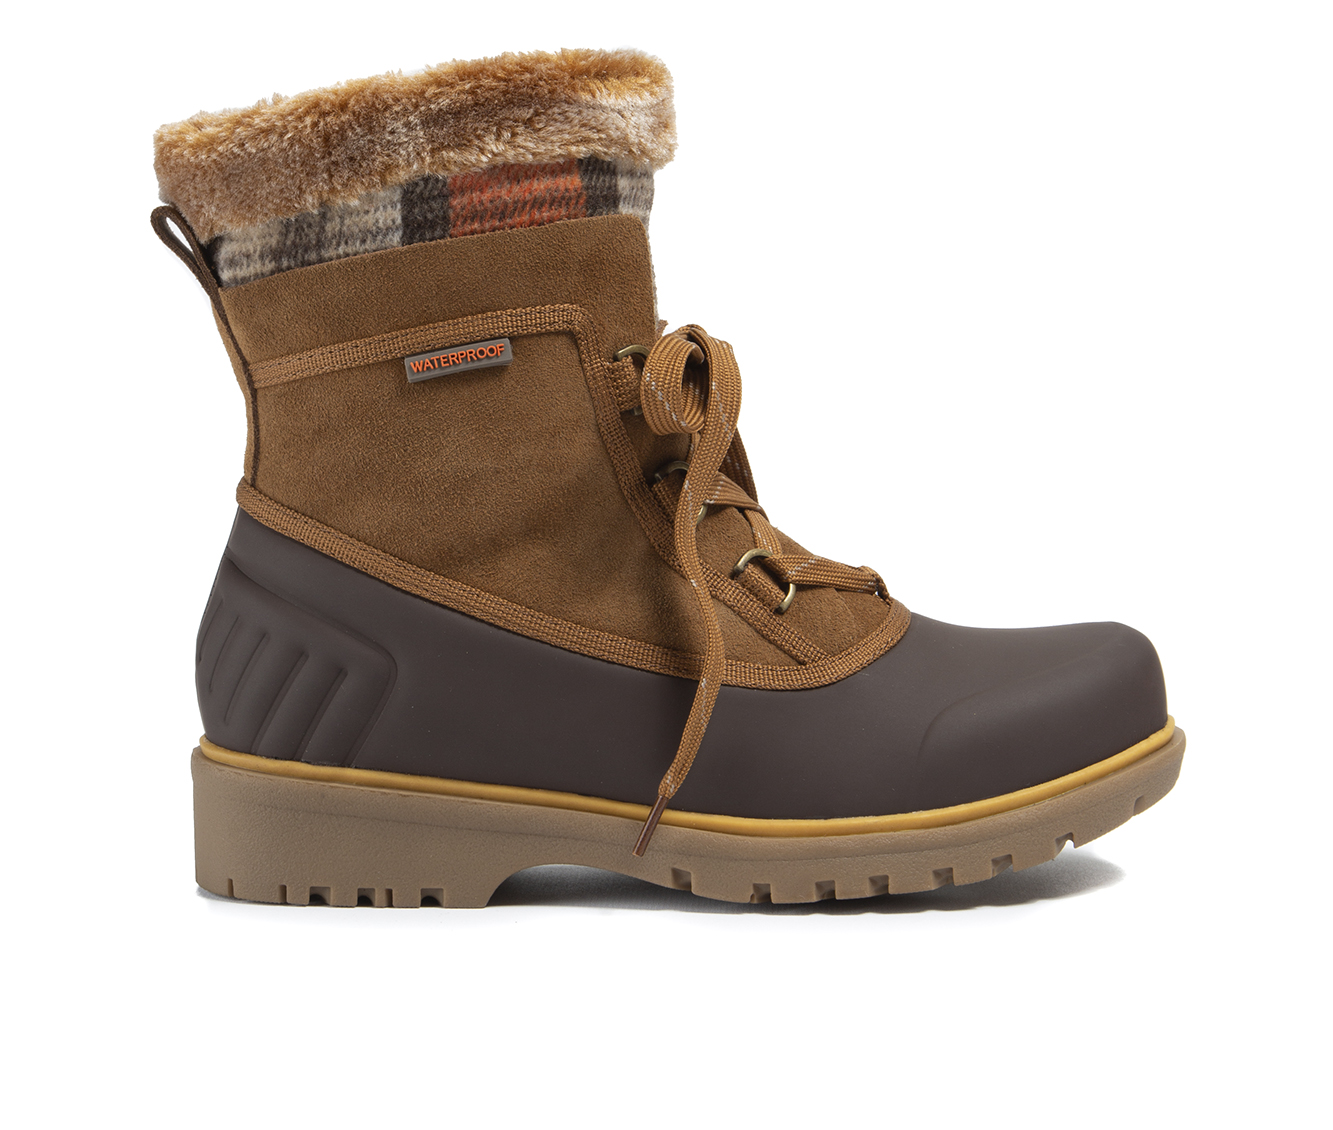 Baretraps Shai Women's Boot (Brown Faux Leather)